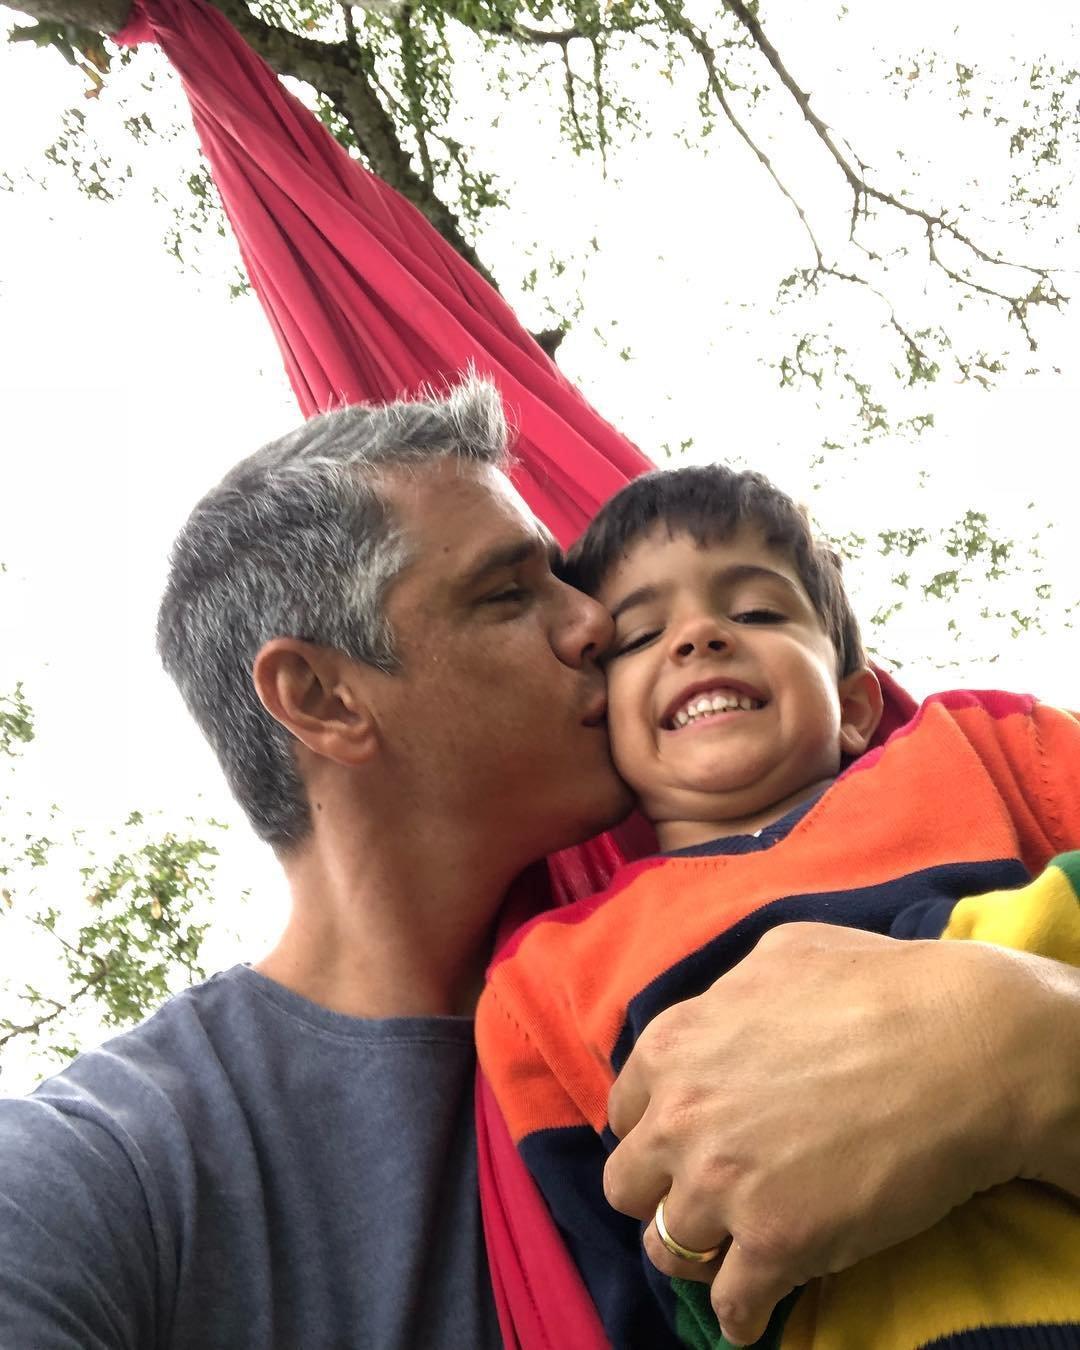 39047505 312242702859815 4035777663342739456 n.jpg?resize=1200,630 - Márcio Garcia posta foto do filho nu e gera polêmica: Inapropriado ou inofensivo?